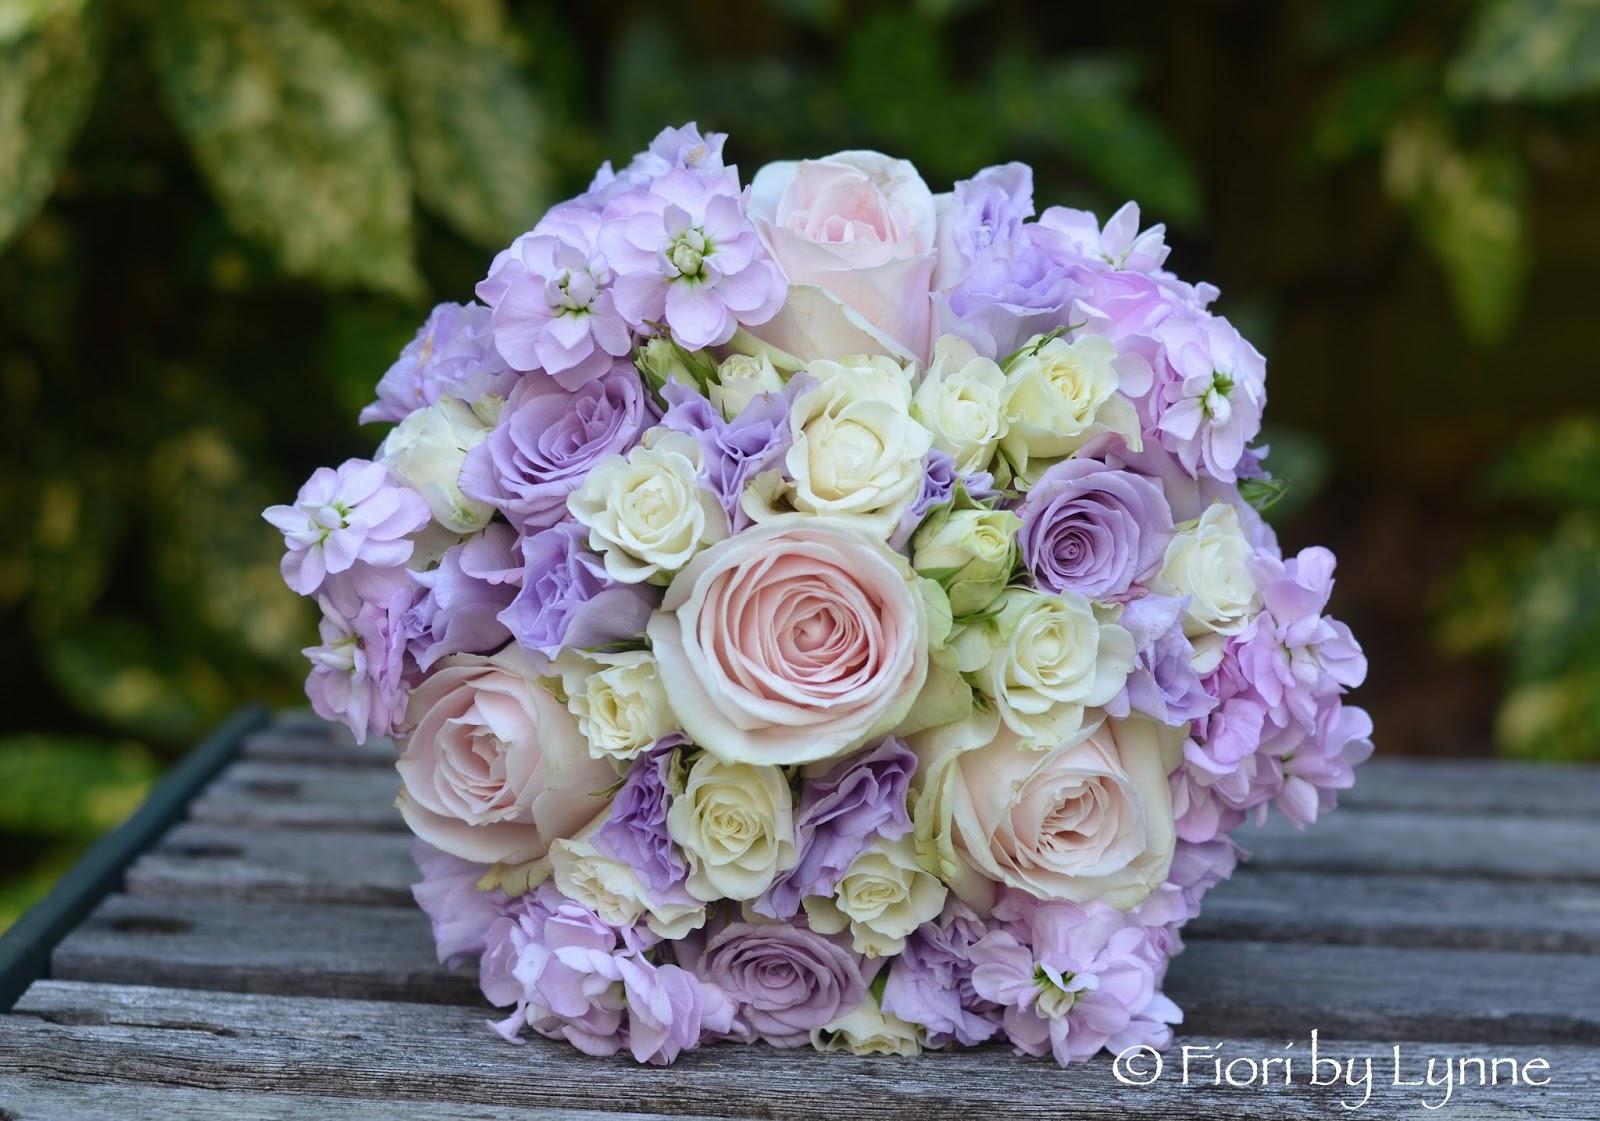 Wedding Flowers Blog: Lara's Pink And Lilac Summer Wedding